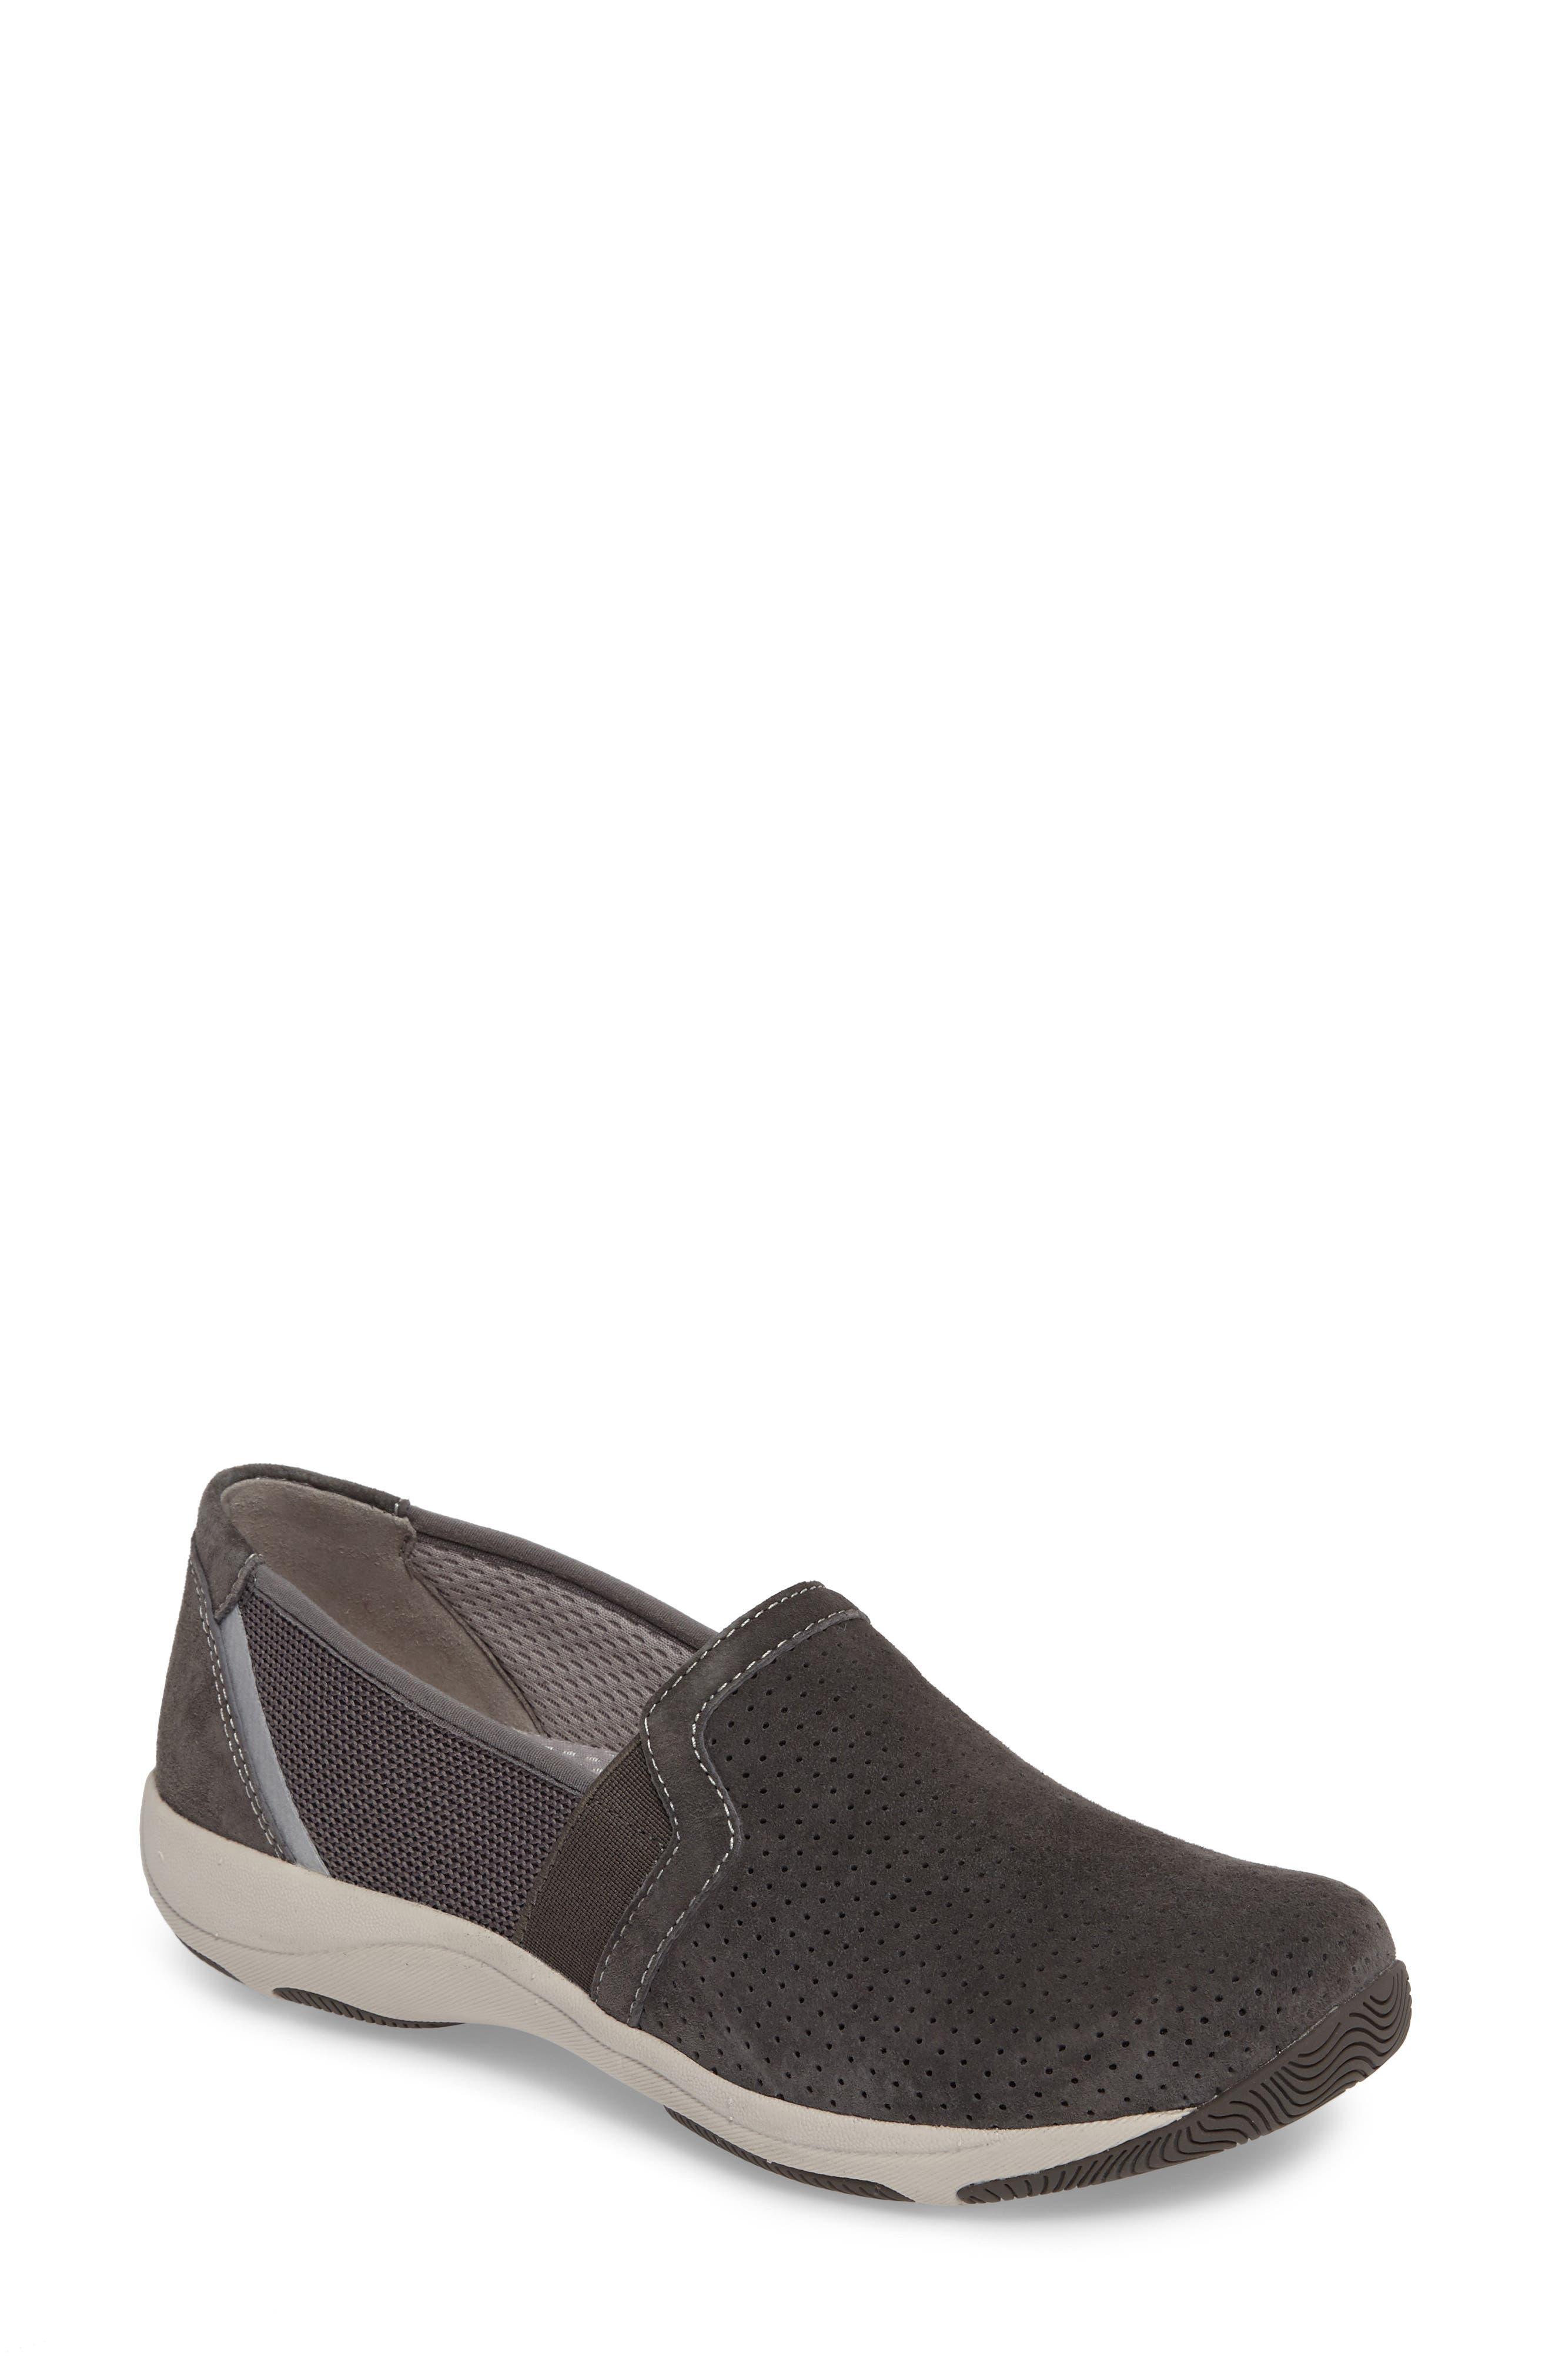 Alternate Image 1 Selected - Dansko Halifax Collection Halle Slip-On Sneaker (Women)